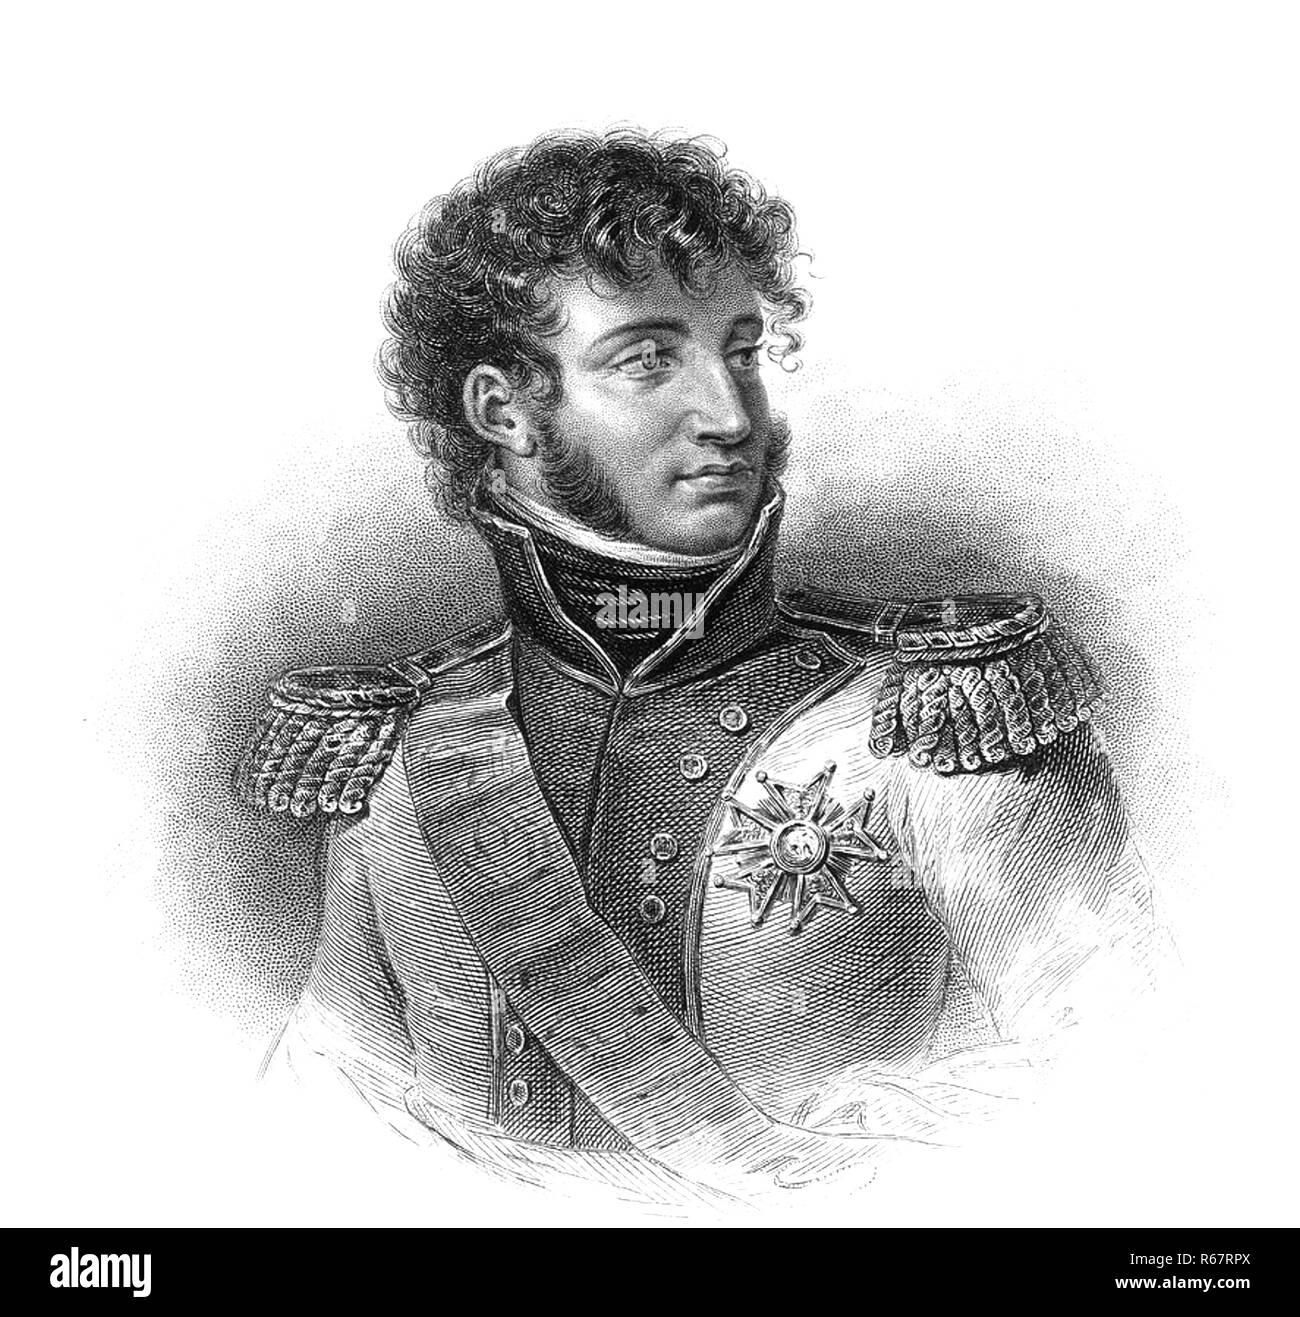 JOACHIM MURAT (1767-1815) Marshal and Admiral of France under Napoleon - Stock Image